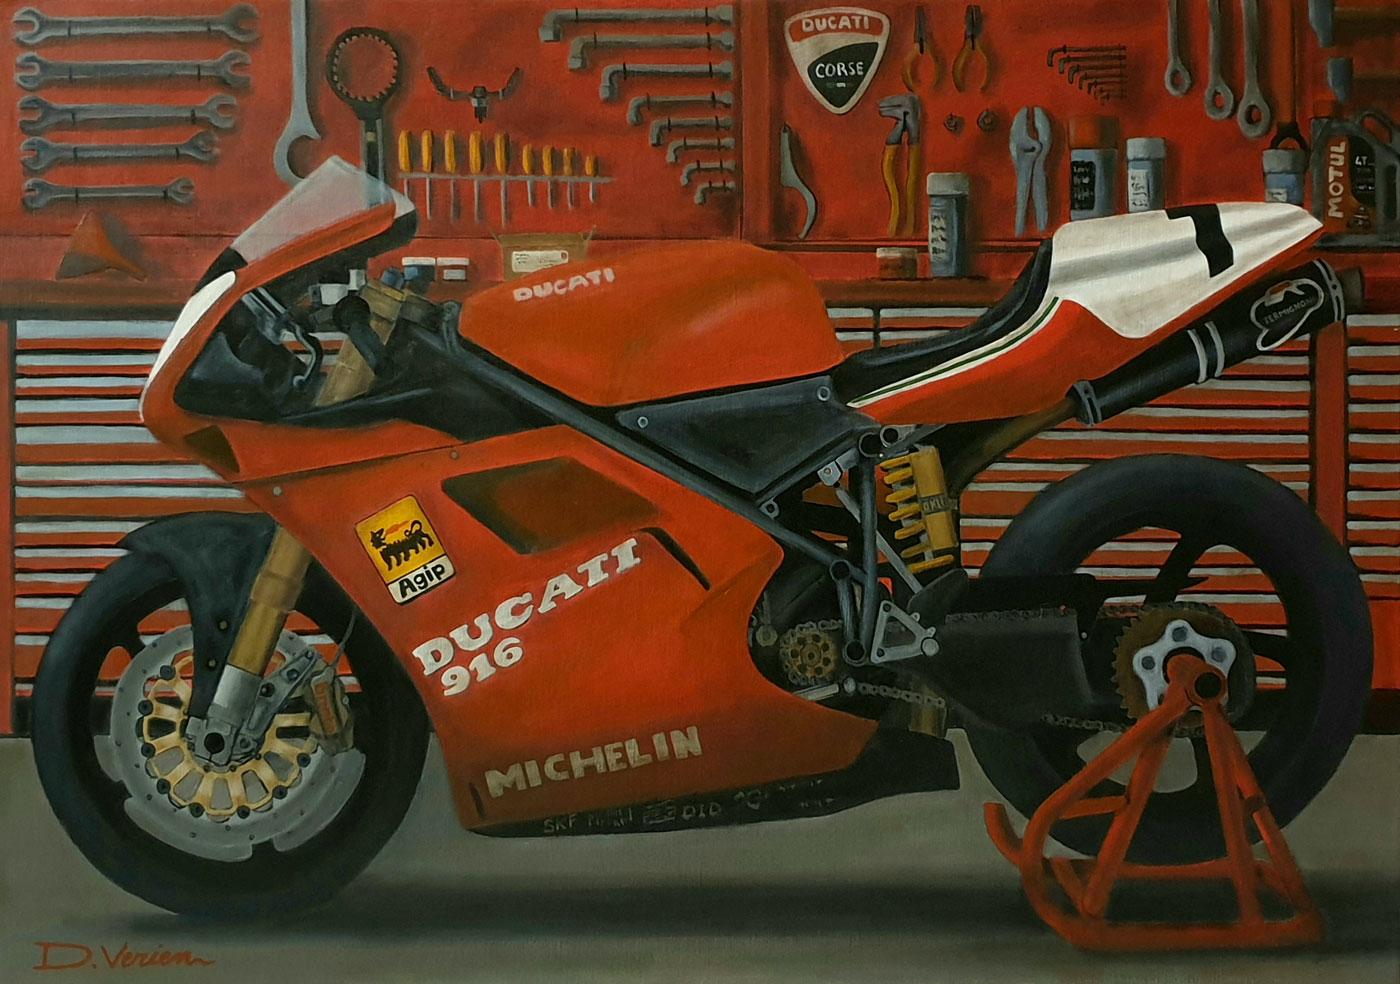 Ducati 916 SBK